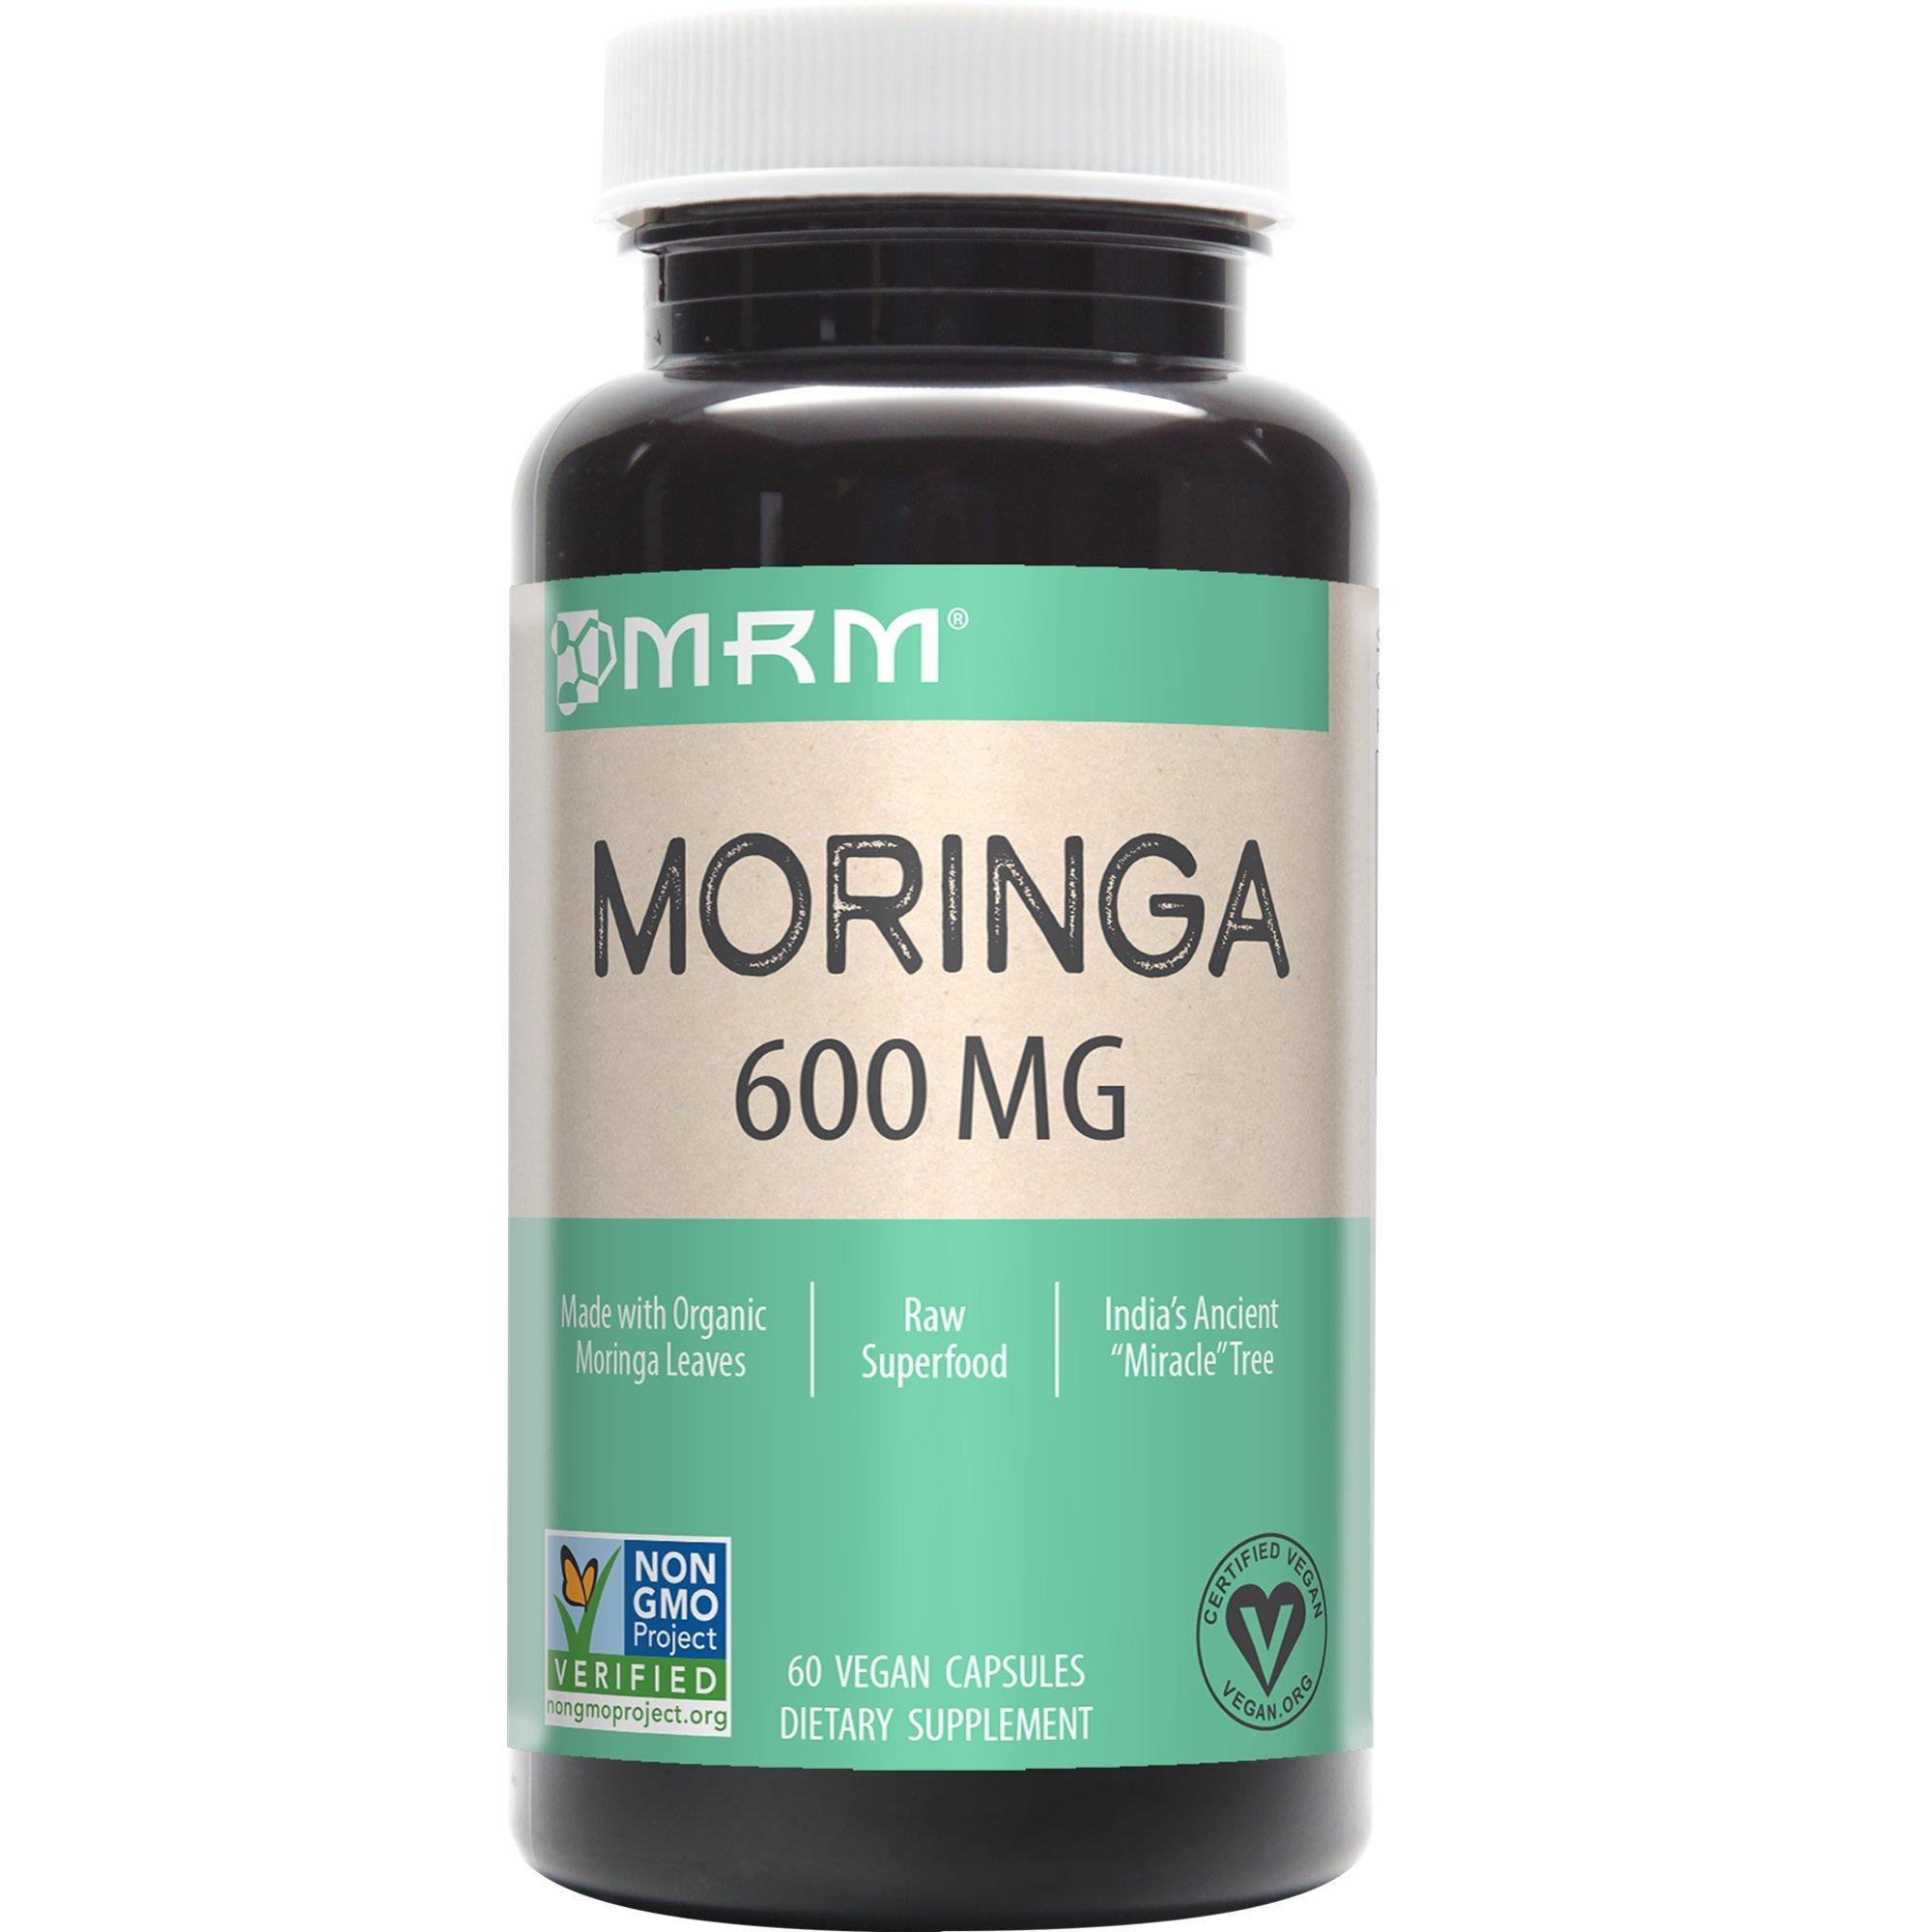 MRM - Moringa Raw Superfood, Non-GMO Verified, Vegan and Gluten-Free (60 Count)